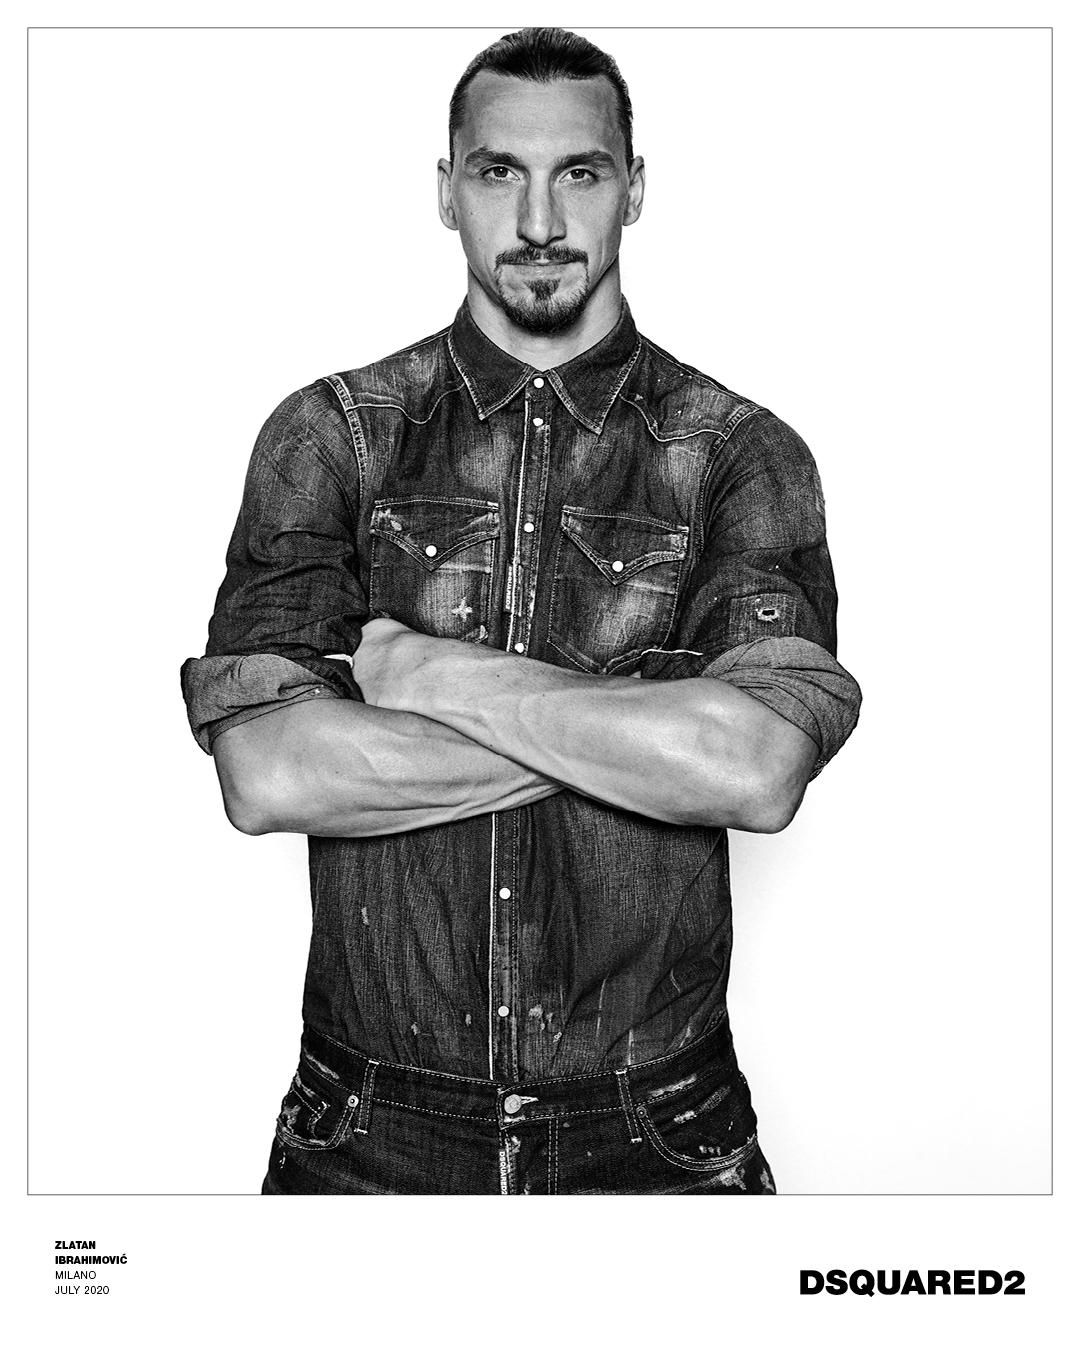 ICON Dsquared2 x Zlatan Ibrahimović